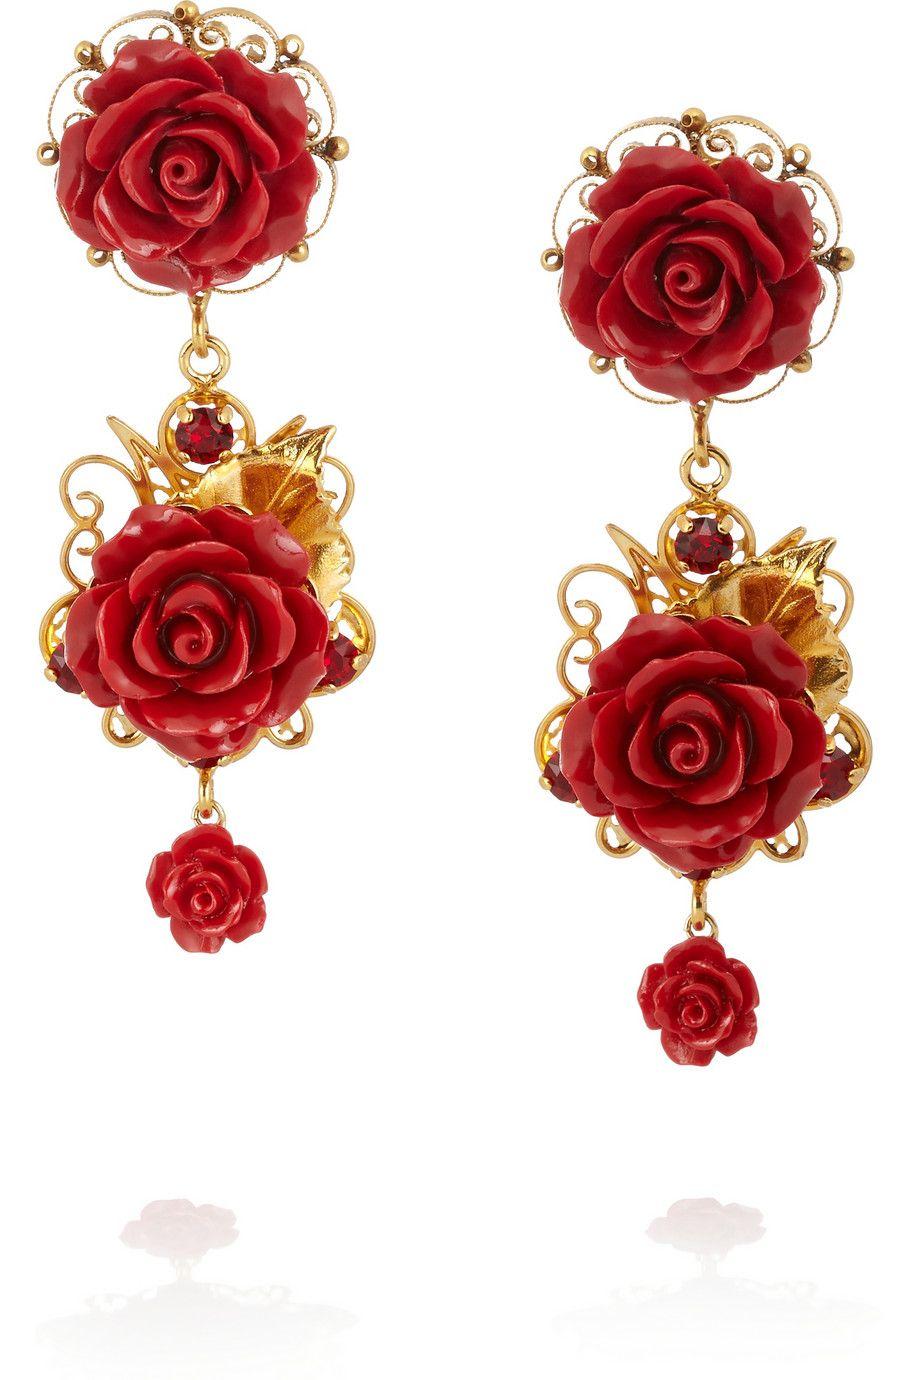 Rose Boucles D'oreilles En Résine Dolce & Gabbana rUvAYNBzI6